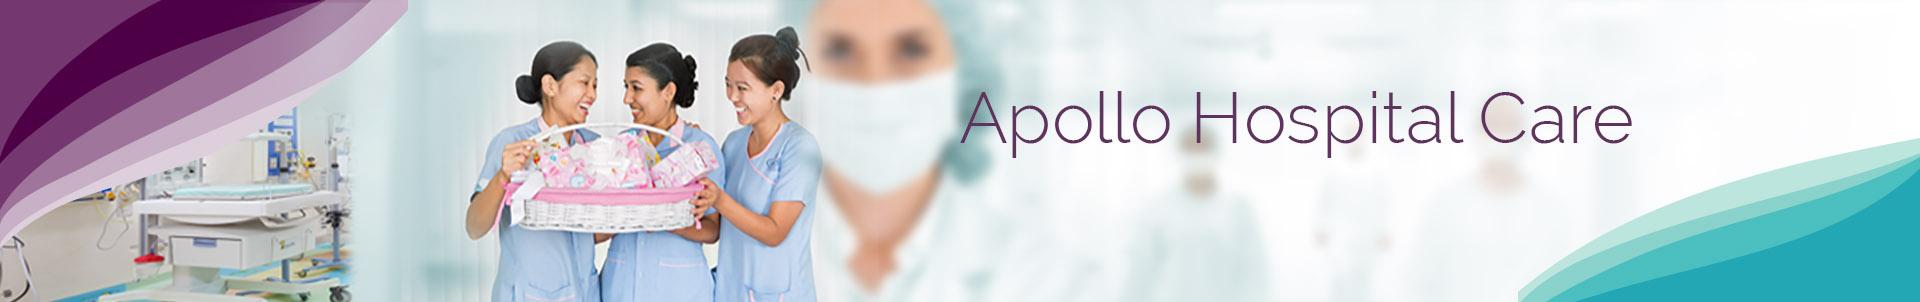 Apollo Hospital Care